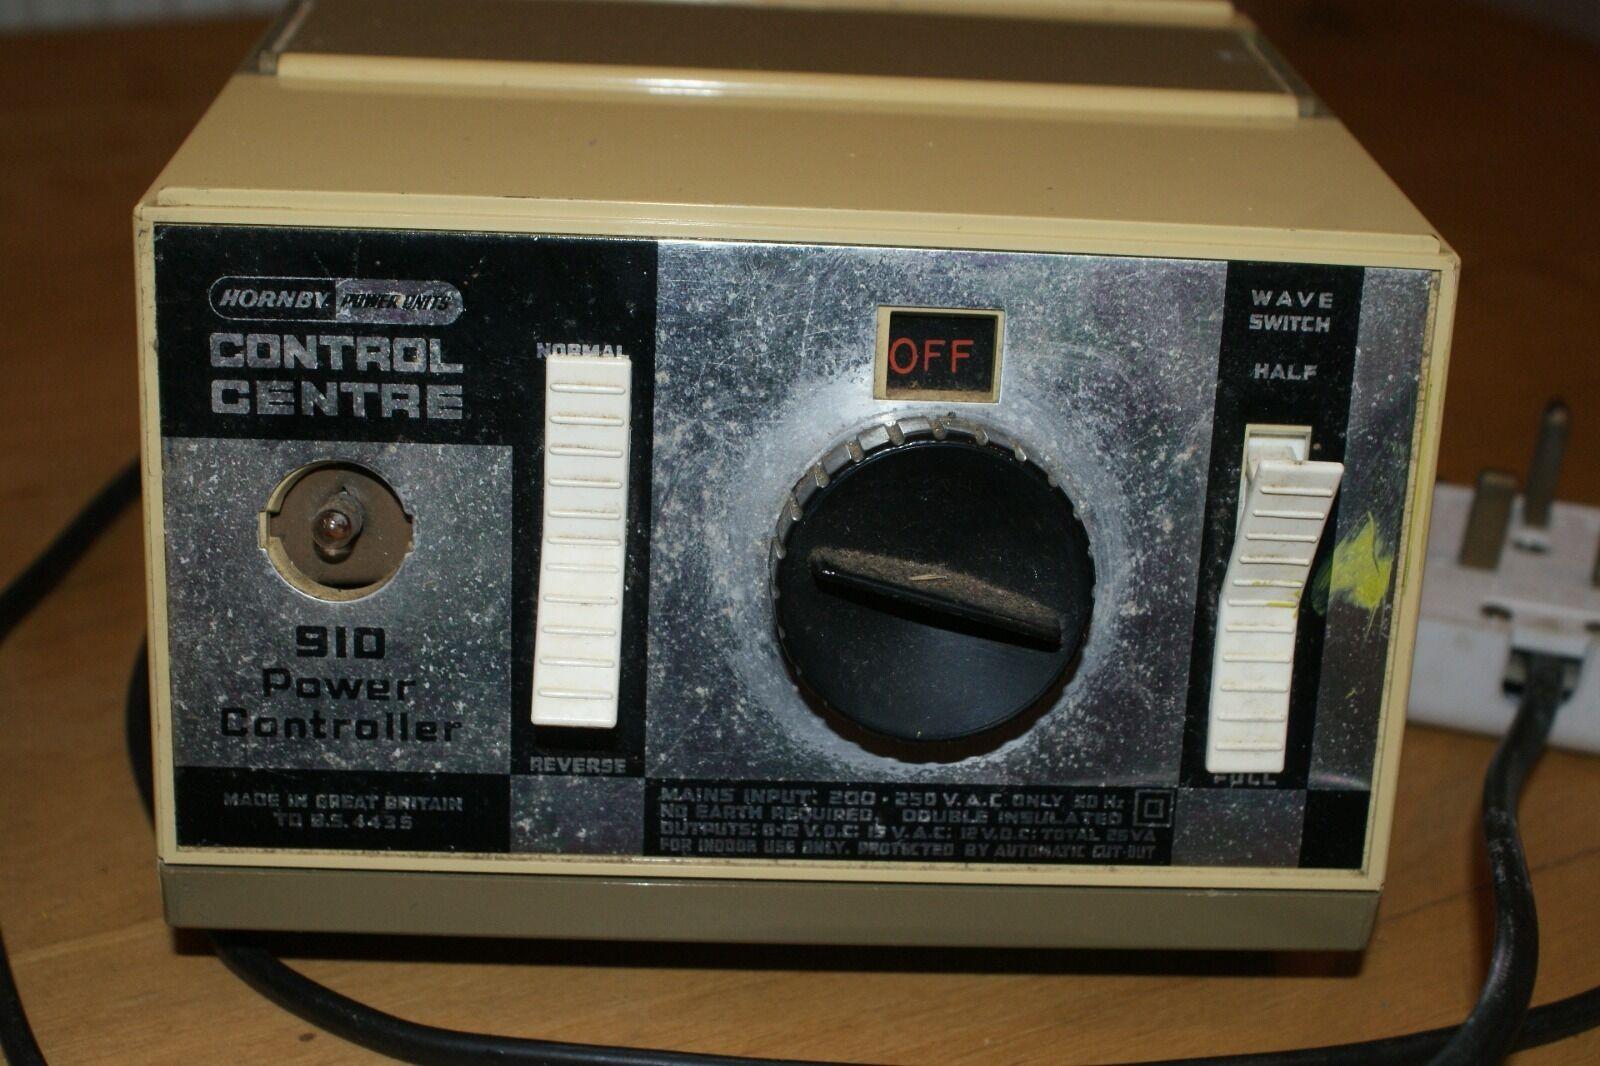 VINTAGE Hornby oo gauge R910 Control Centre Power Controler